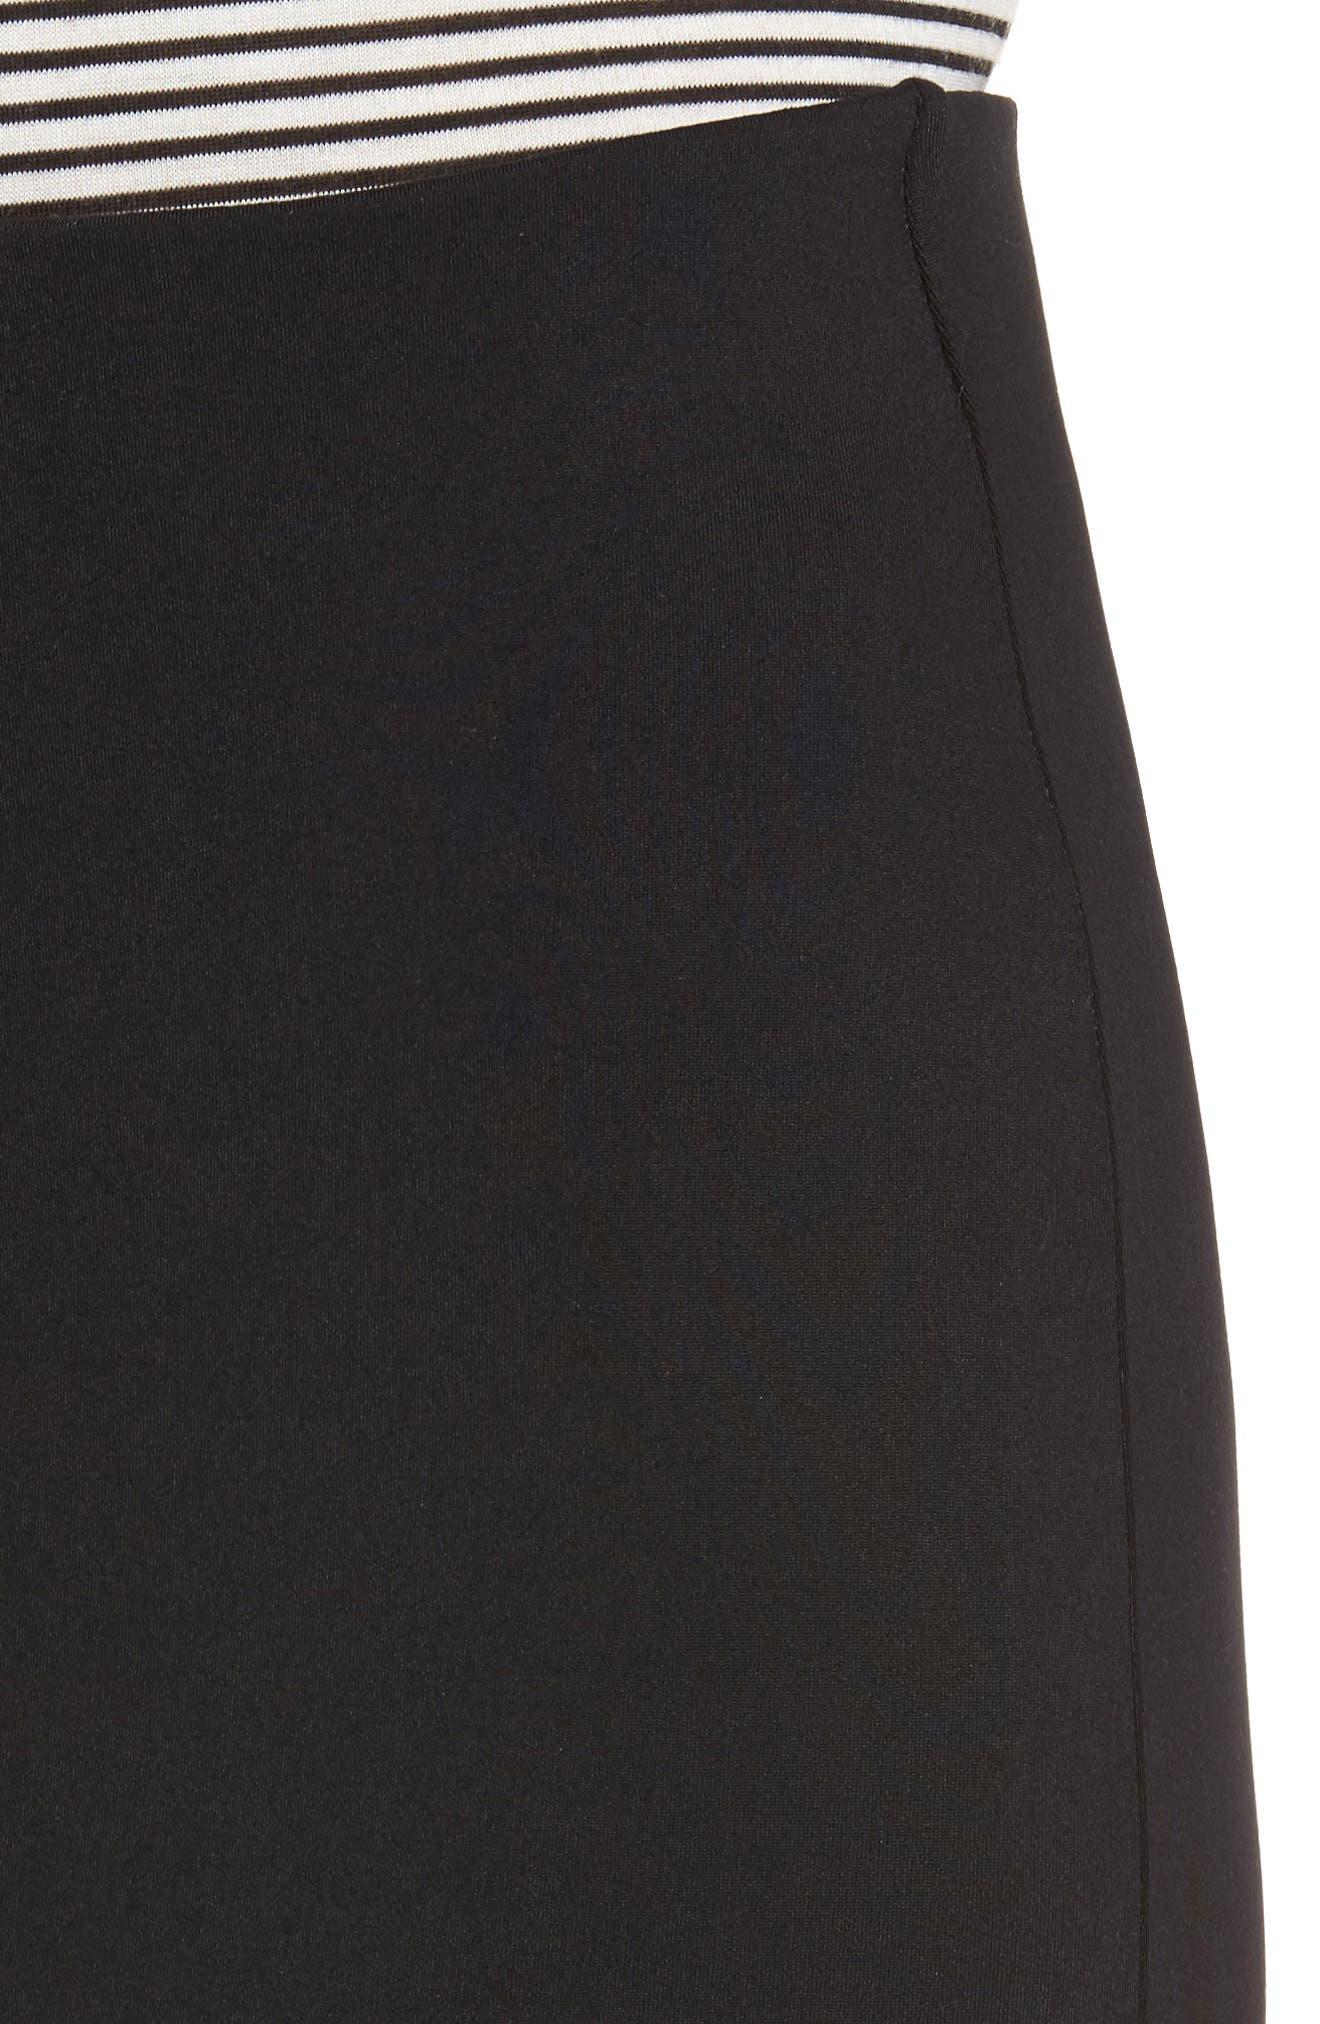 Alternate Image 5  - David Lerner Tube High Rise Pencil Skirt